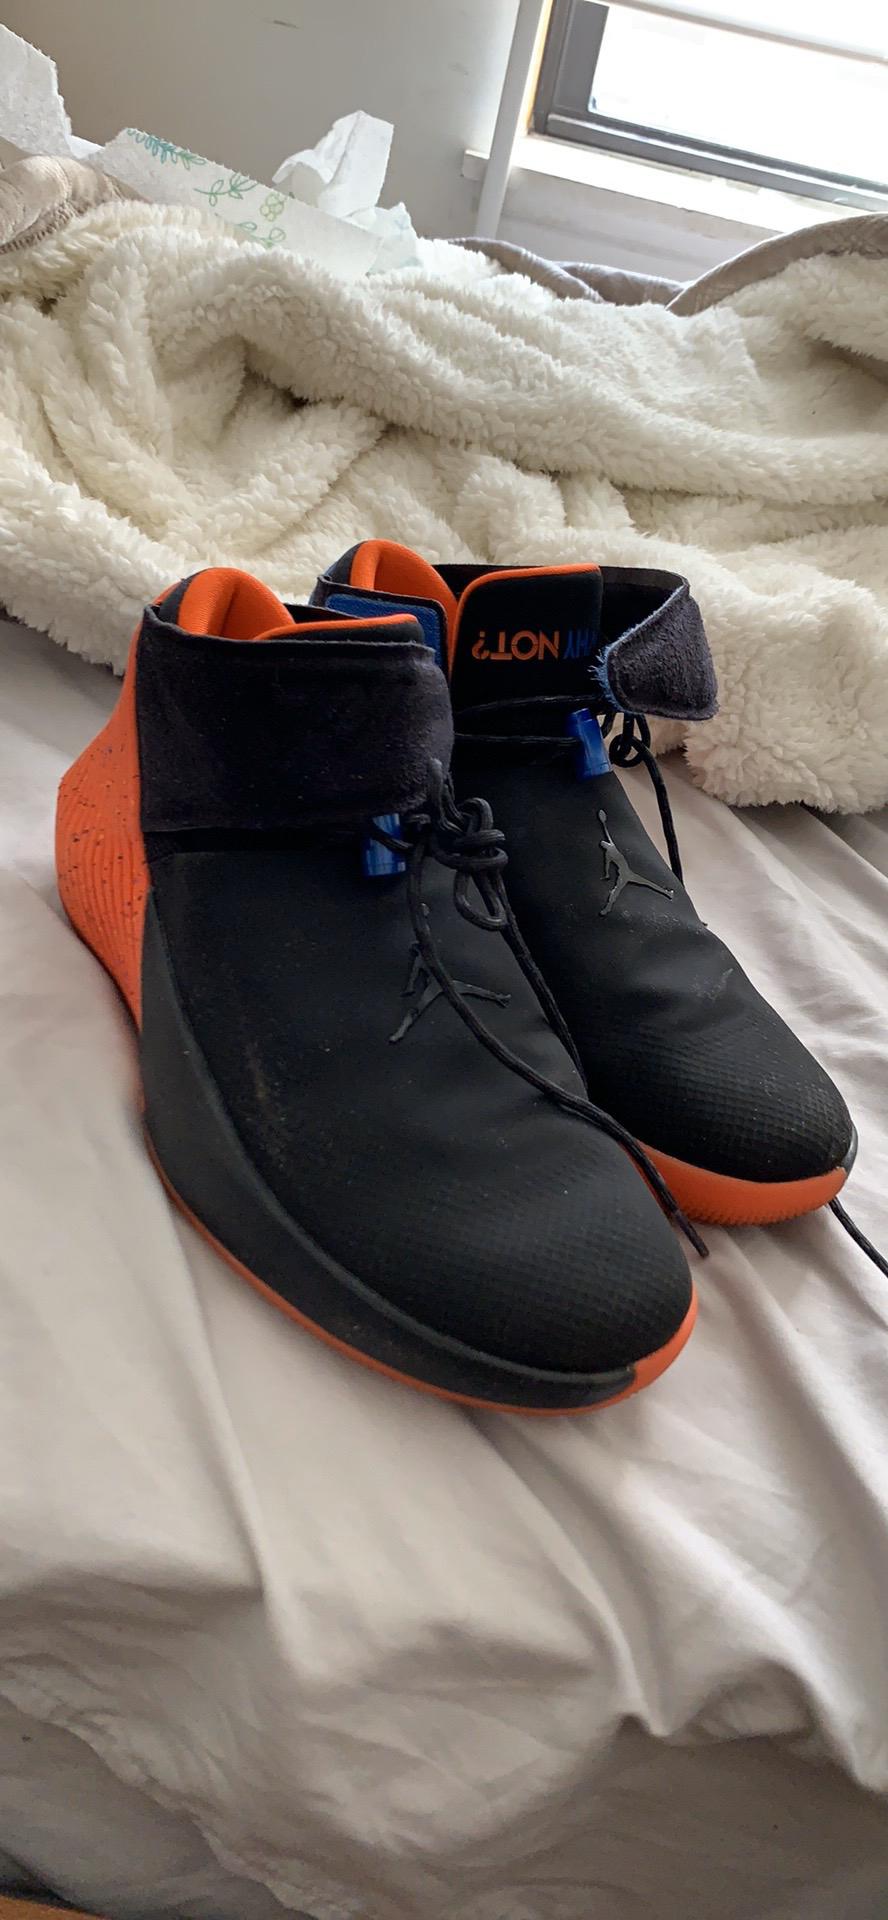 Air Jordan - $80 - Size 9